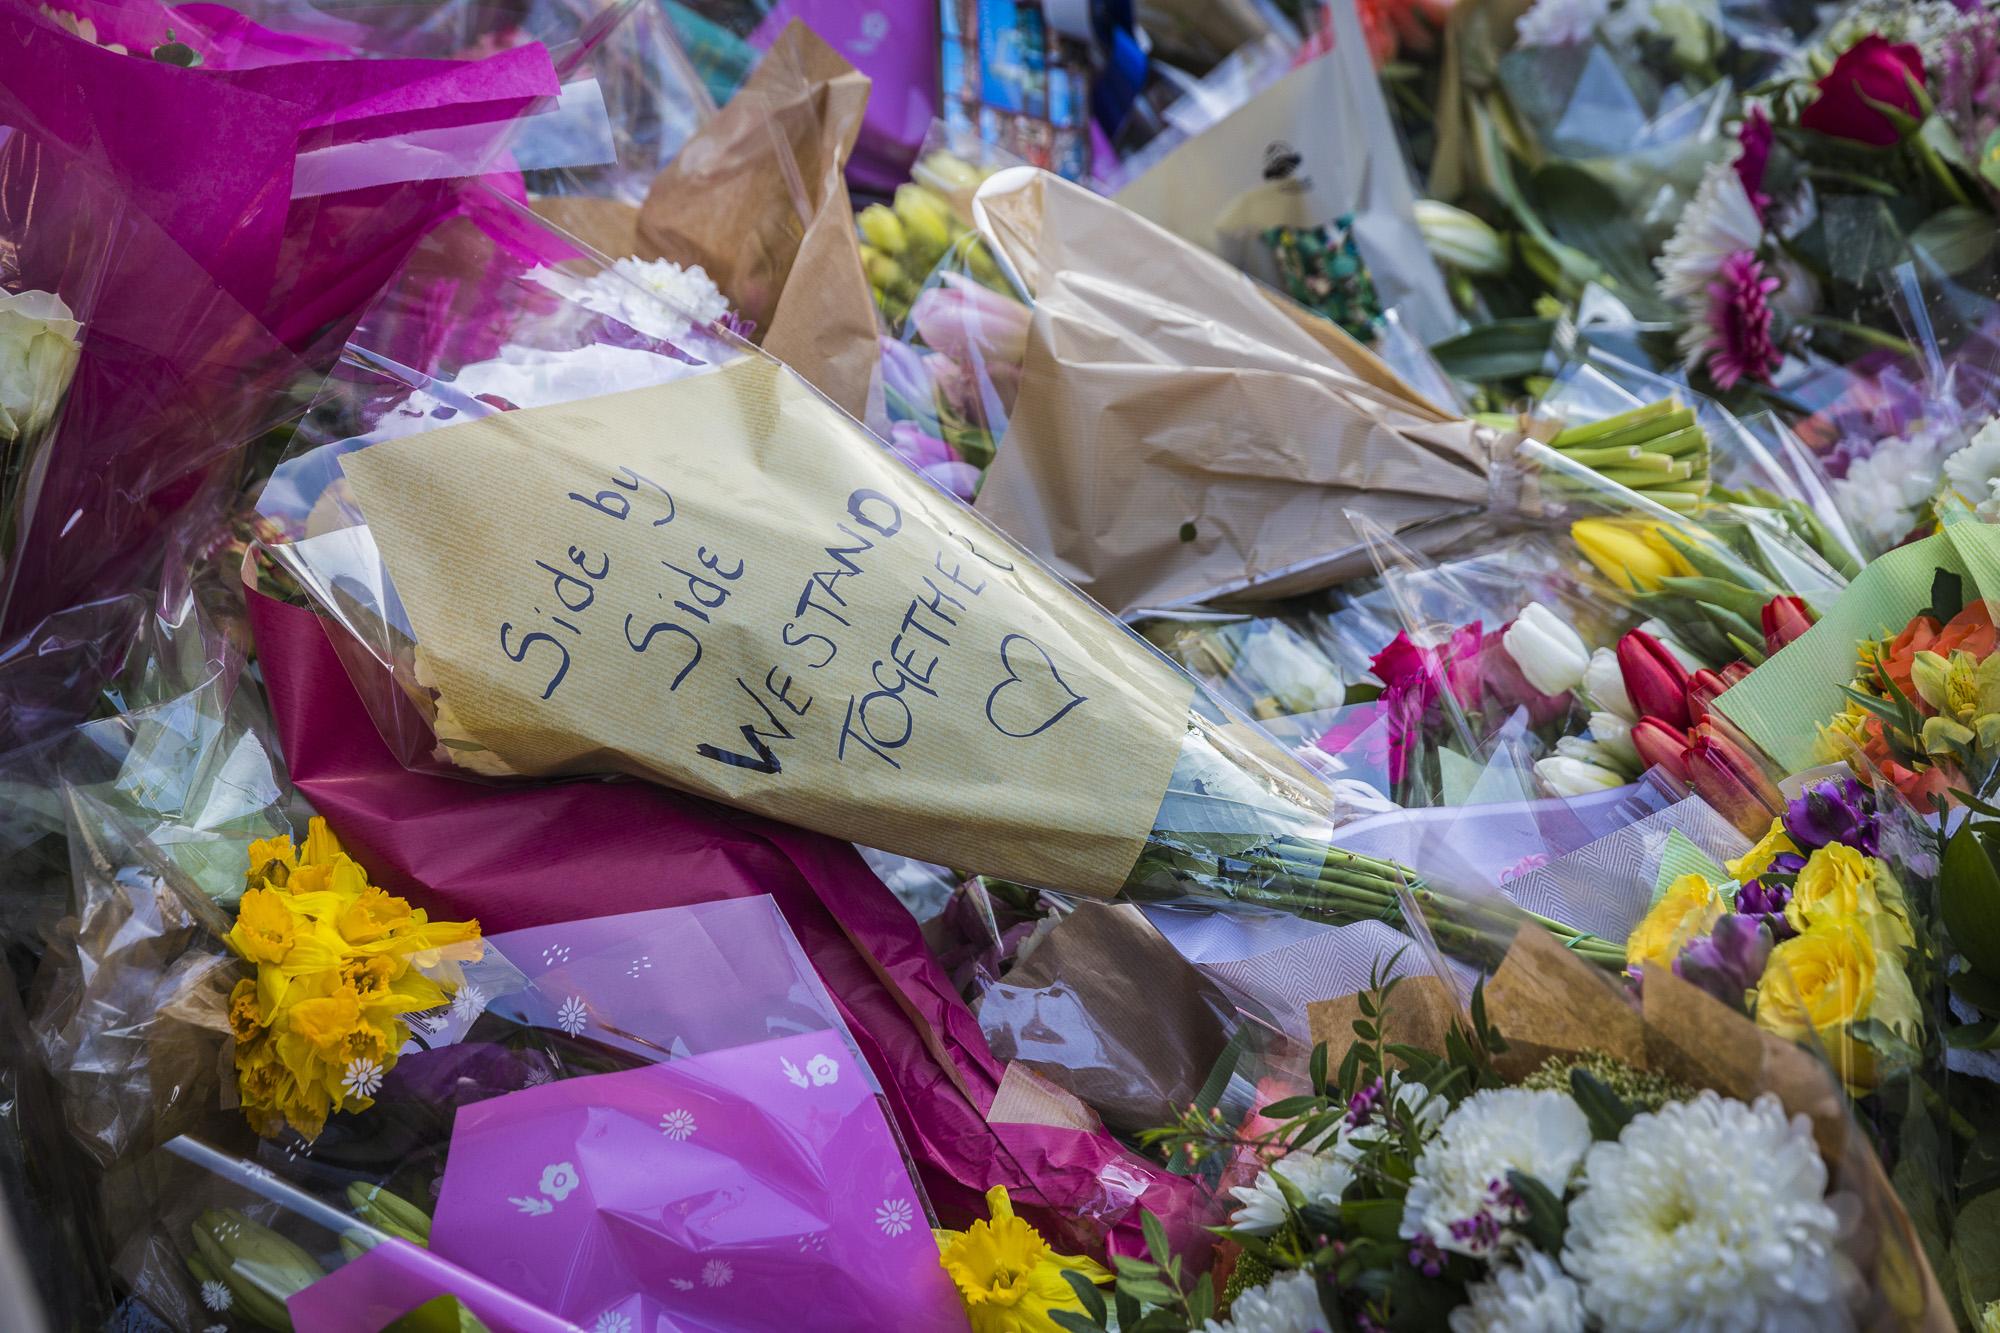 London_Attack_Hope_Not_Hate-18.jpg